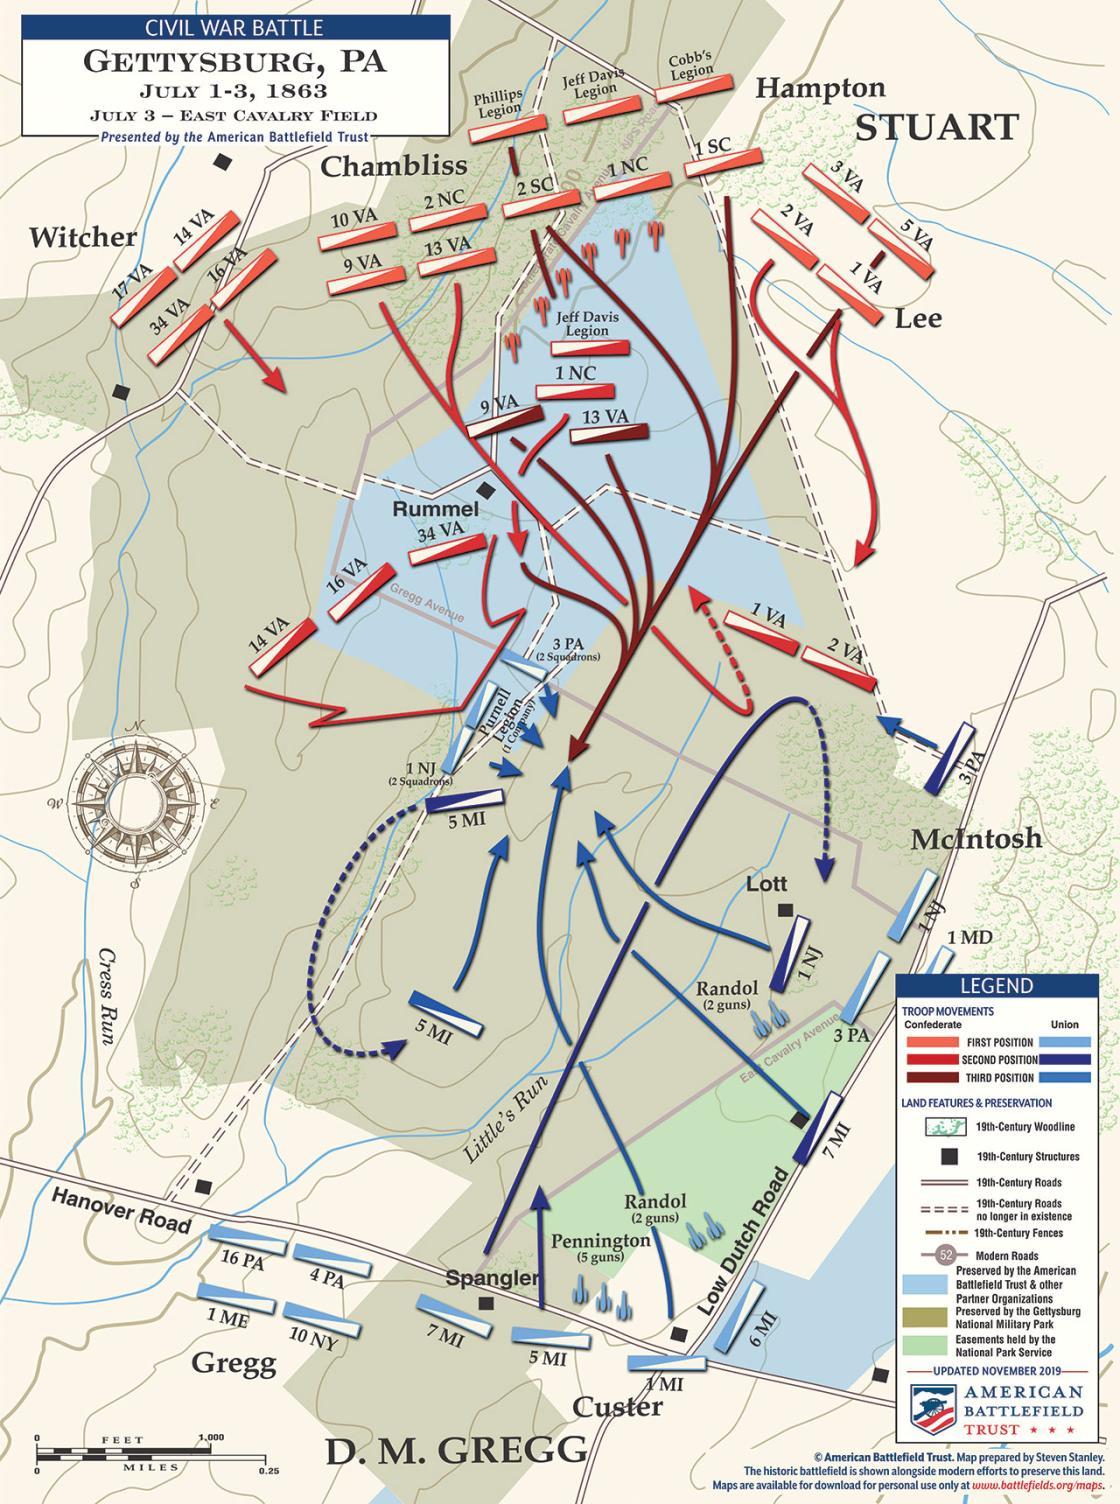 Gettysburg - East Cavalry Field - July 3, 1863 (November 2019)